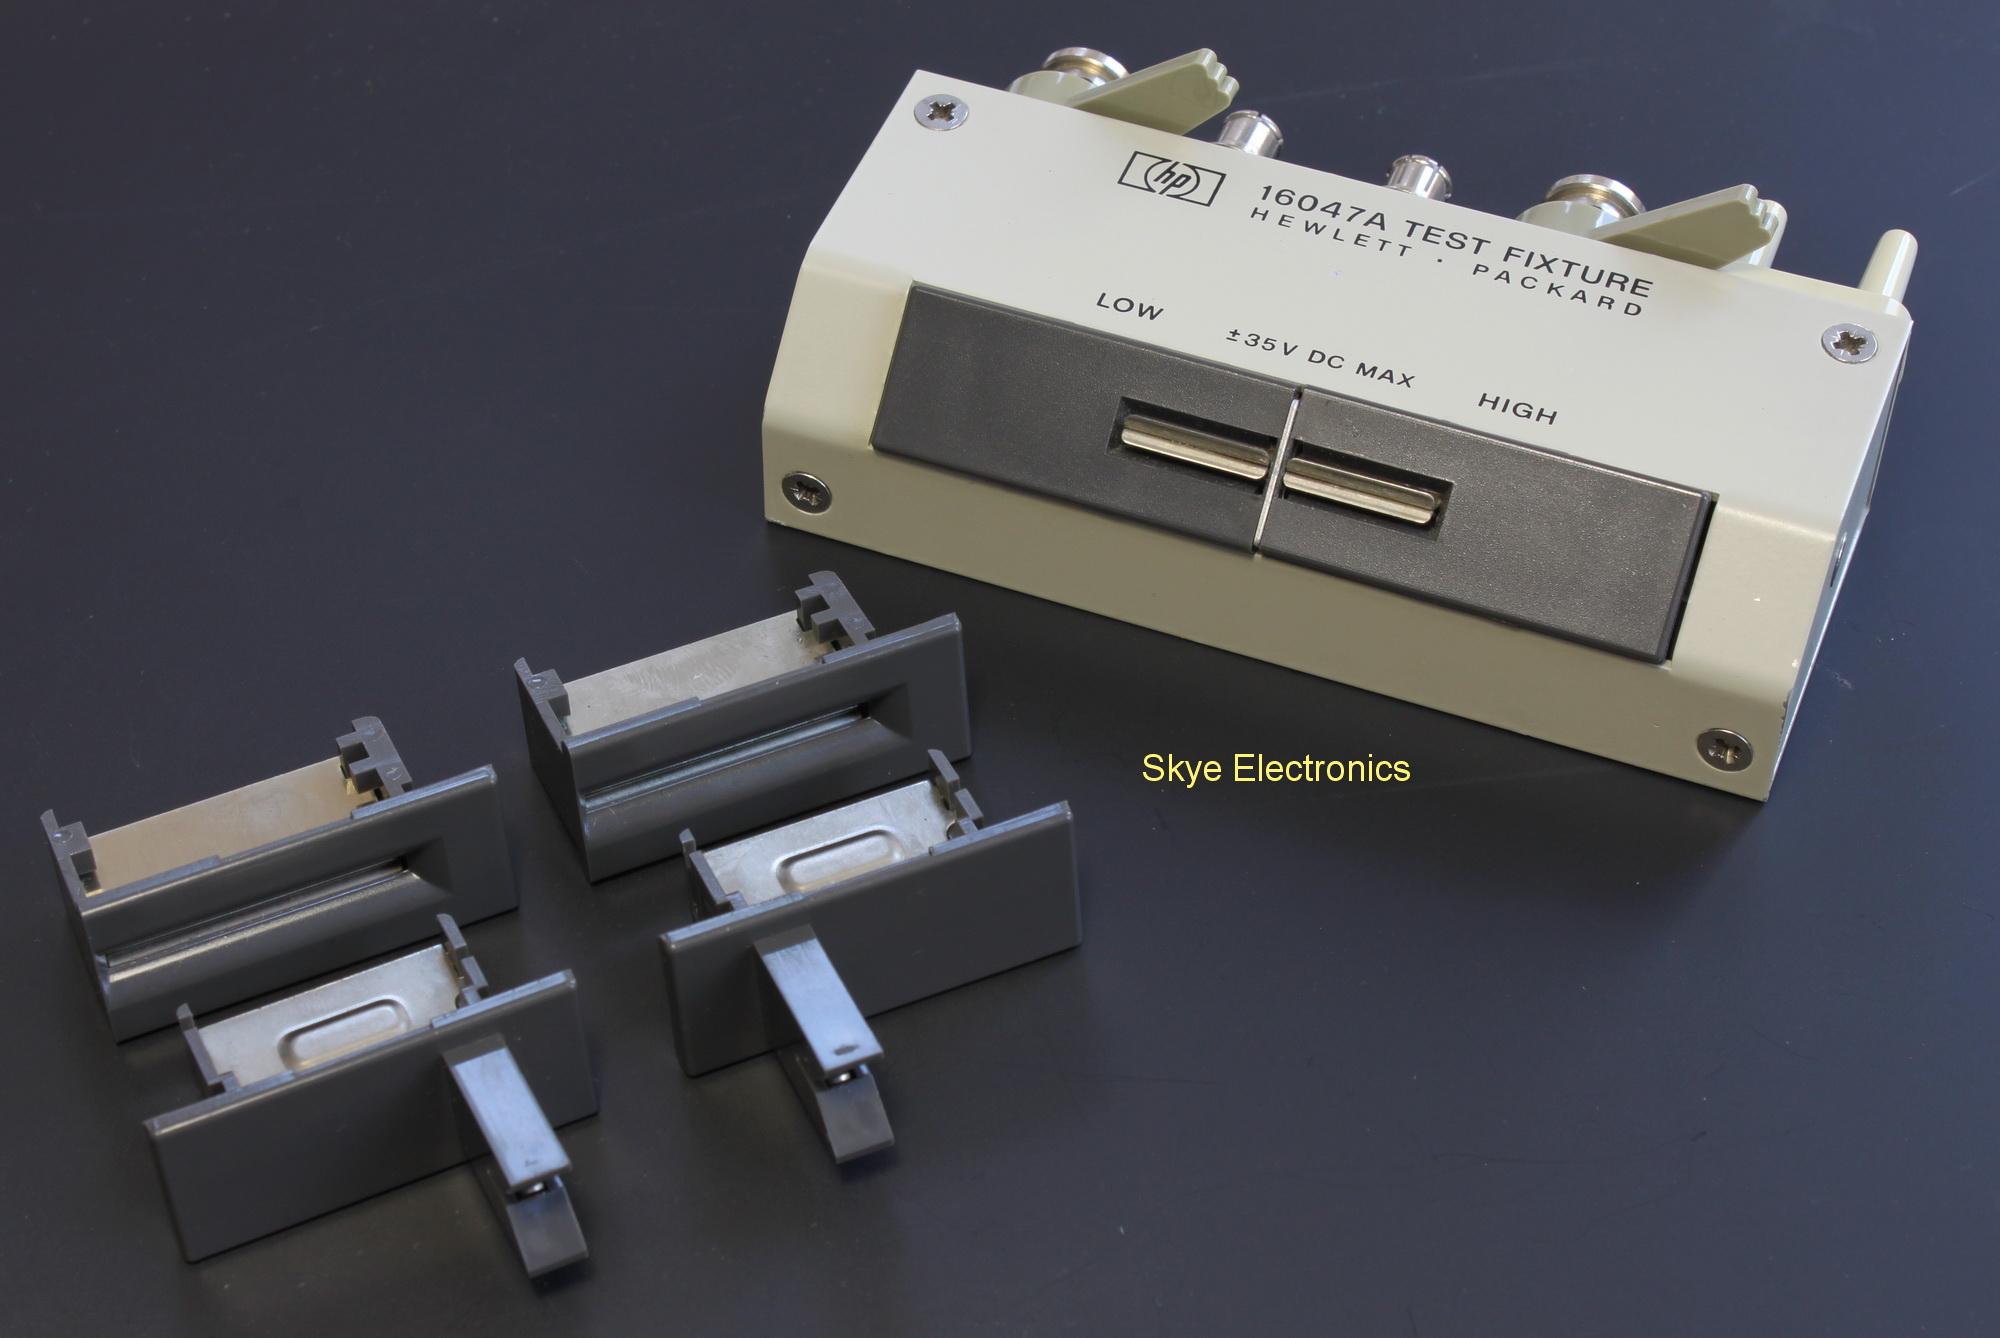 HP 16047A Skye Electronics